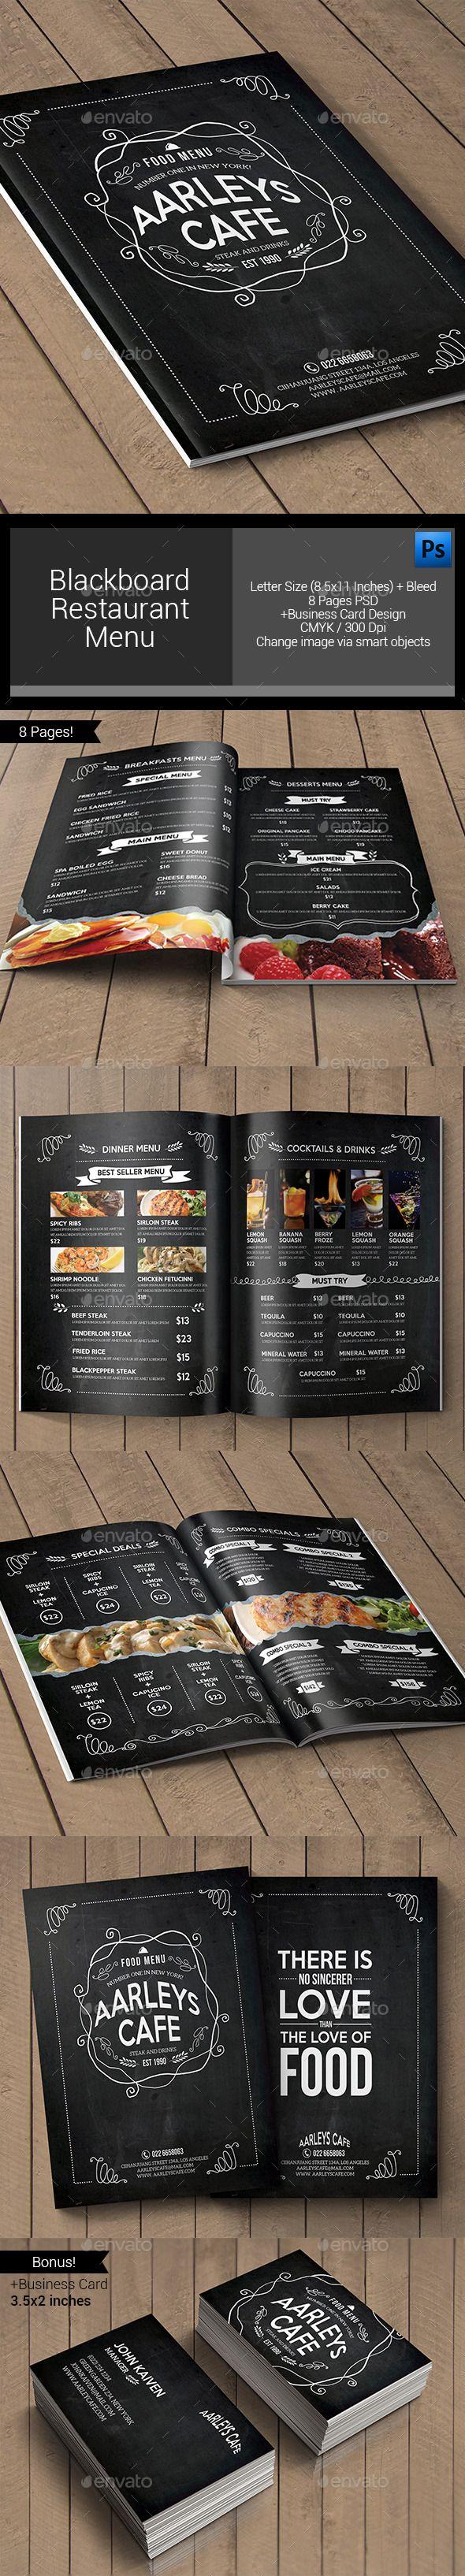 Blackboard Restaurant Menu Template #design Download: http://graphicriver.net/item/blackboard-restaurant-menu/11852511?ref=ksioks